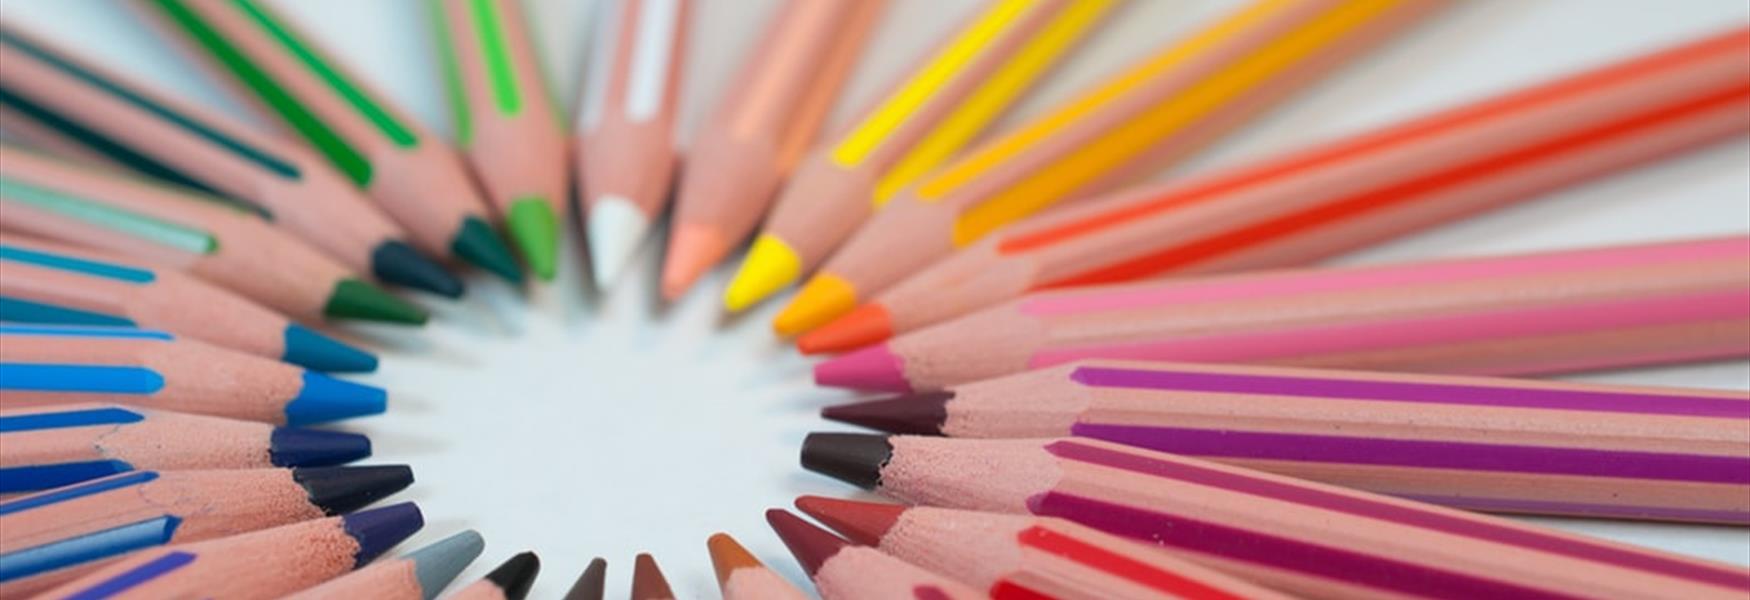 Coloured Pencils by Agence Olloweb on Unsplash - Visit Nottinghamshire